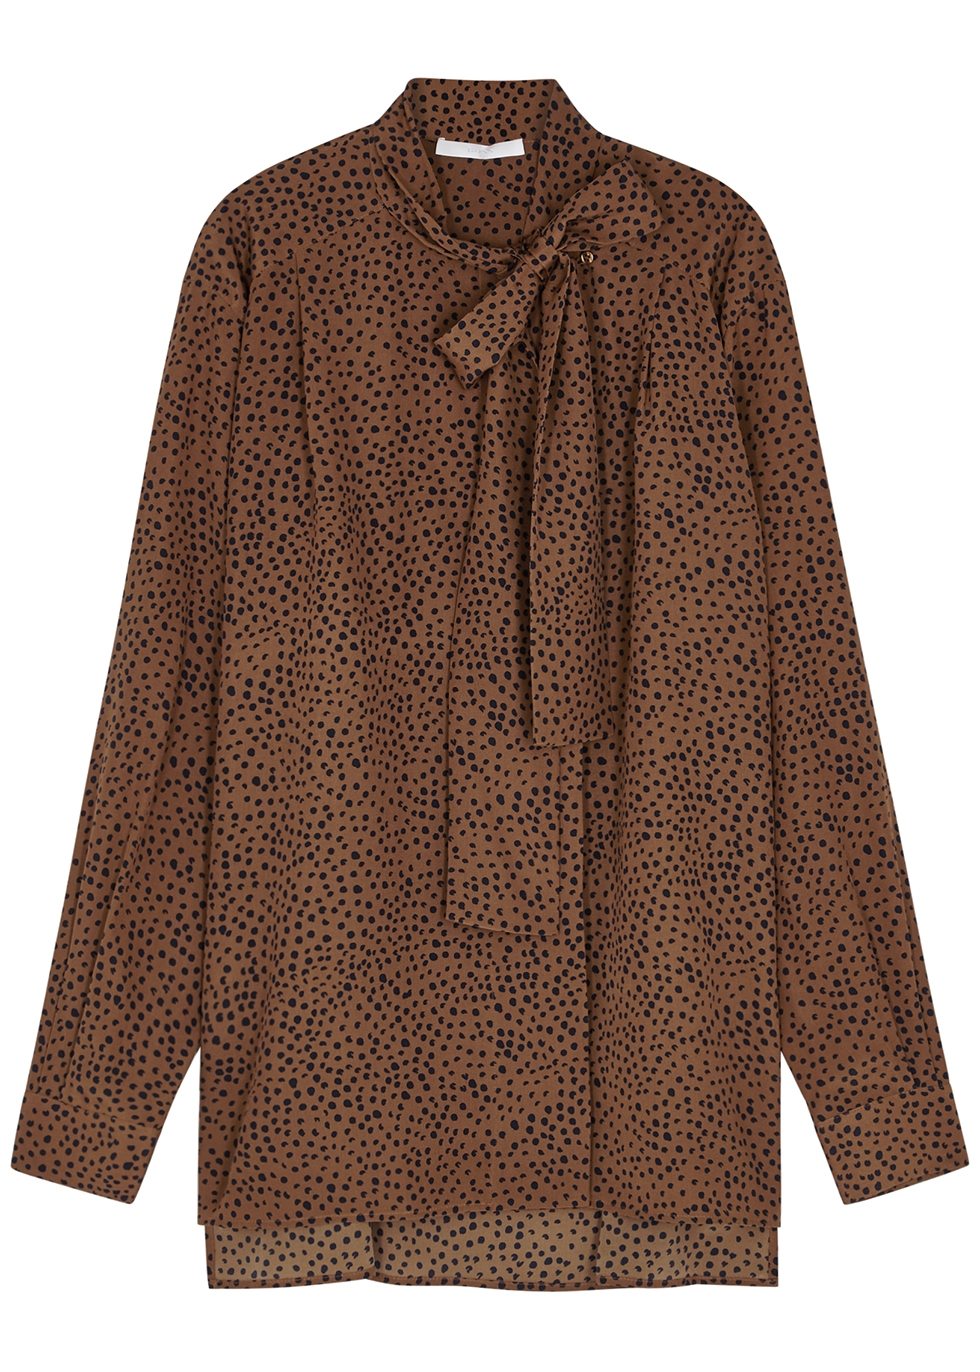 Nichols Silk Designer Harvey amp; Blouses Satin Ruffled Women's vHw0Tq